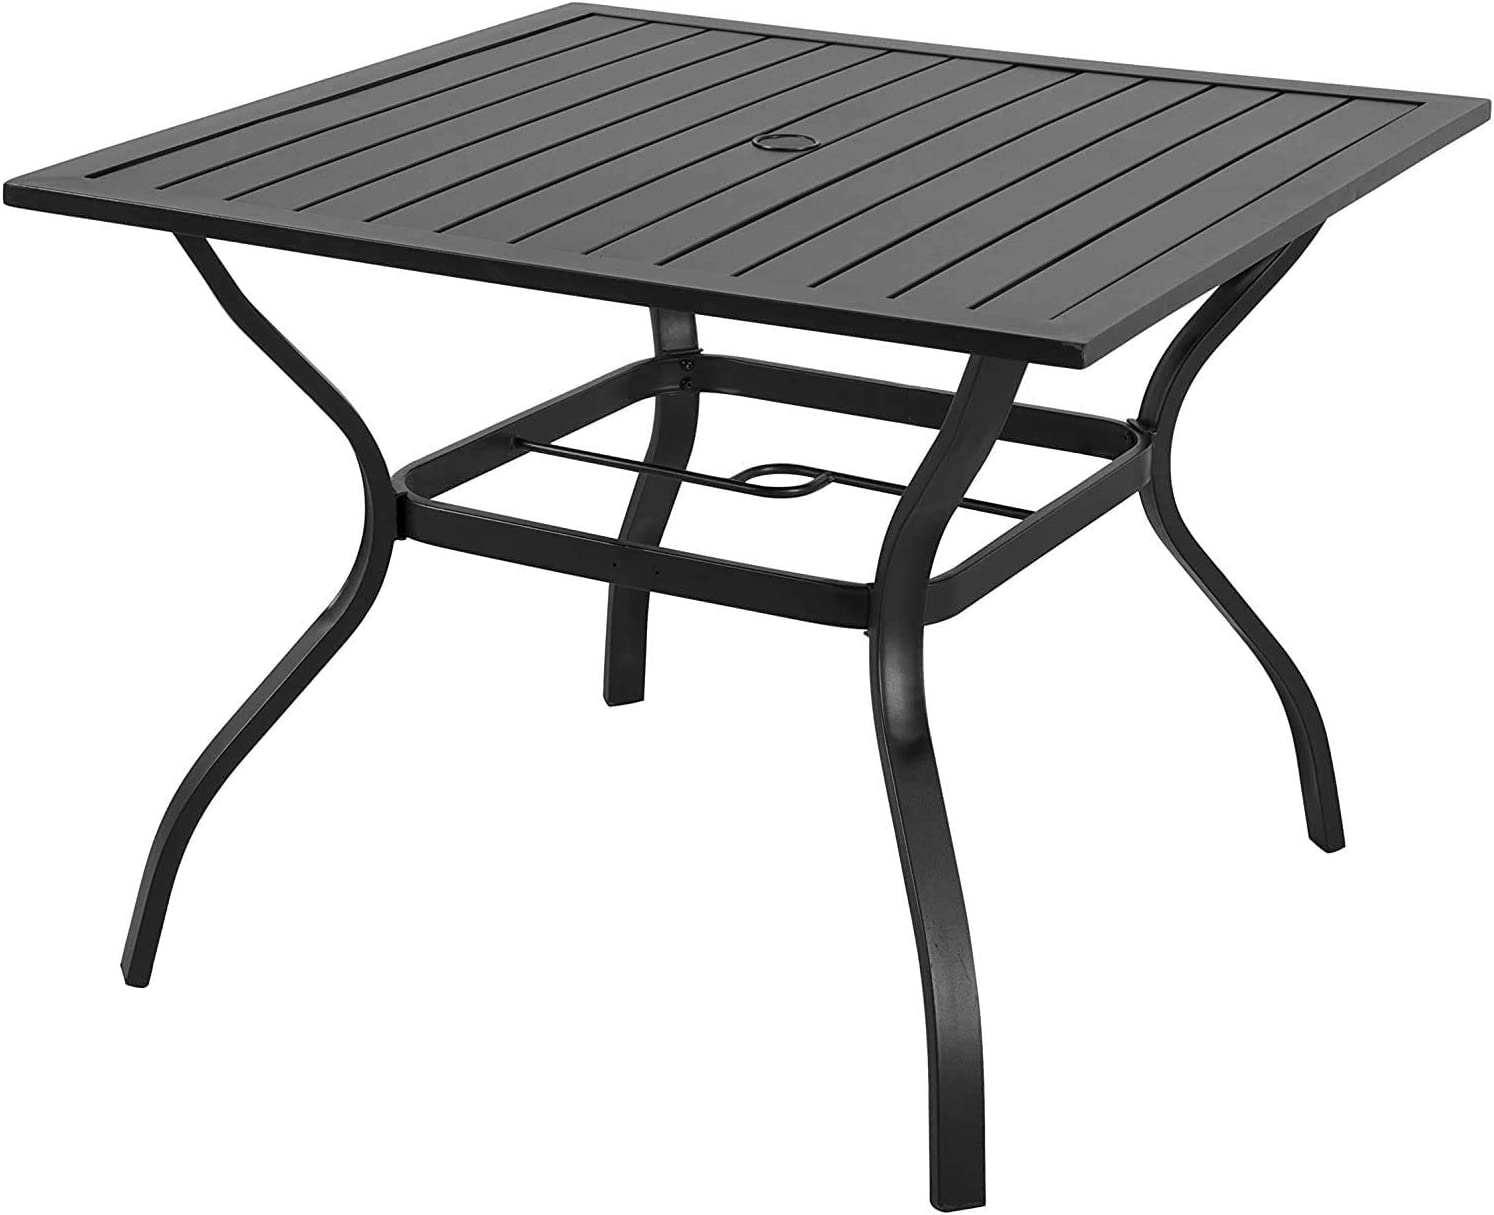 Amazon Com Emerit Outdoor Patio Bistro Metal Dining Table With Umbrella Hole 37 X37 Black Dining Table Garden Outdoor